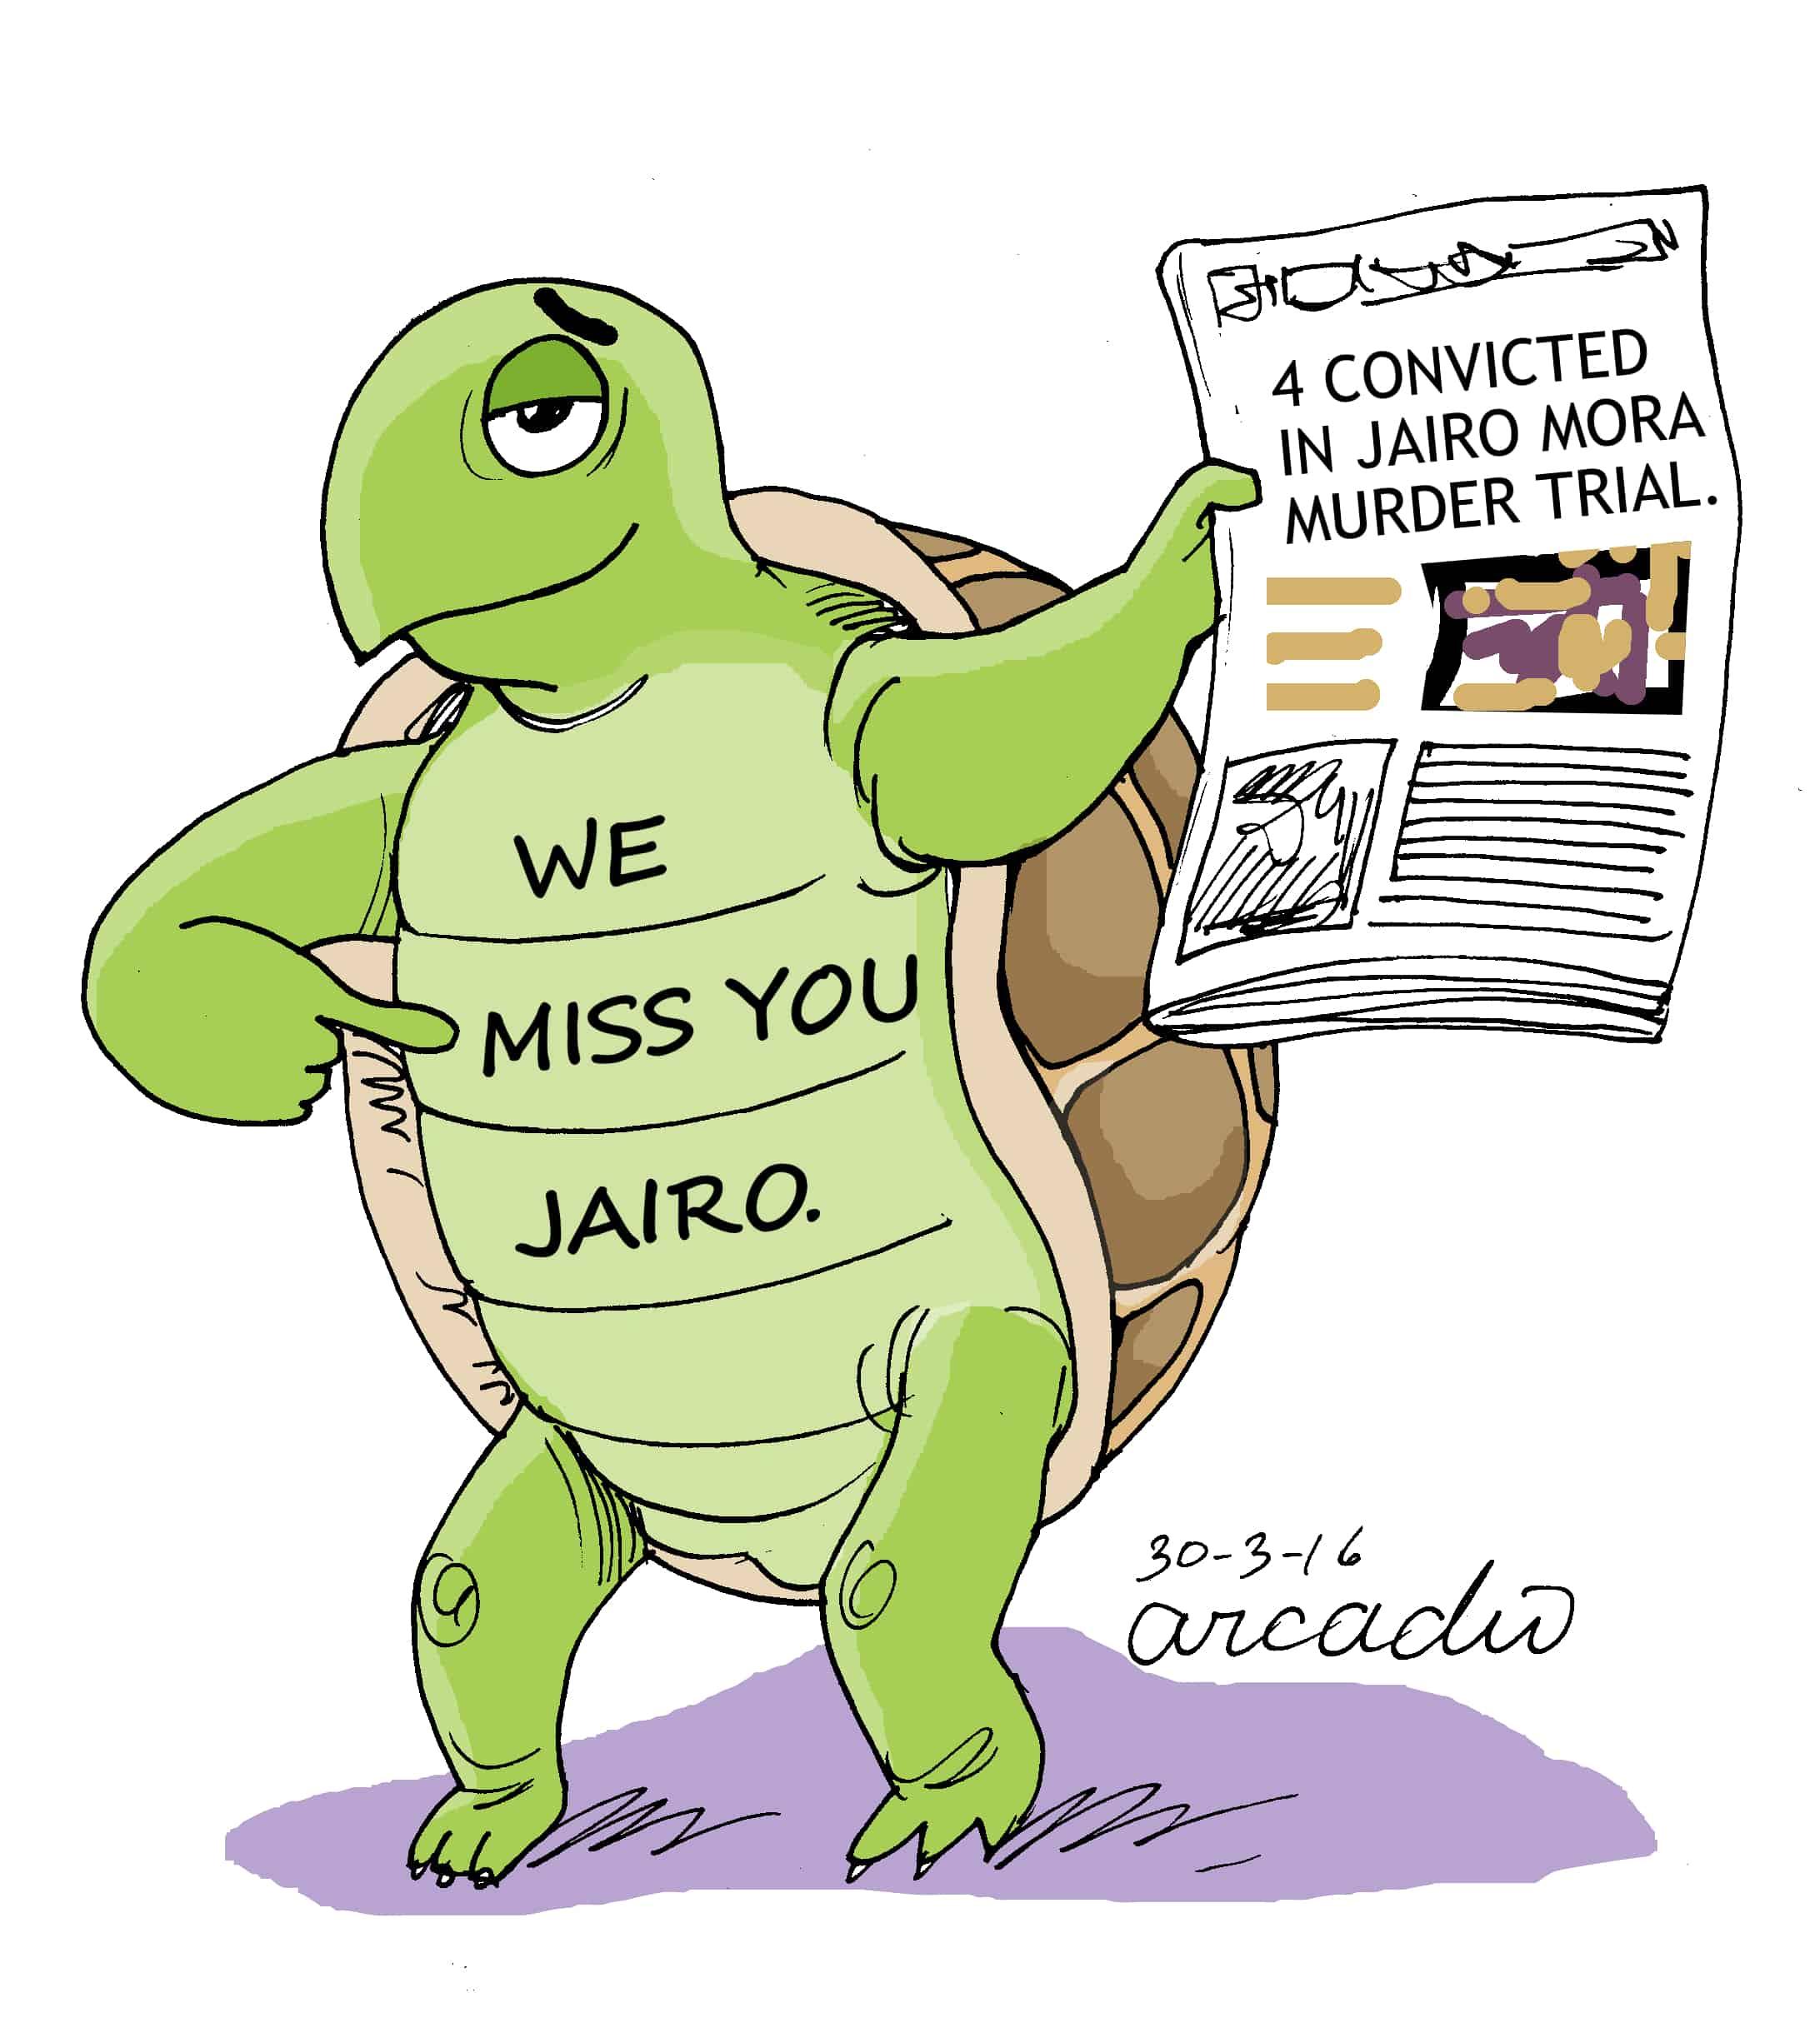 Arcadio cartoon on Jairo Mora murder trial